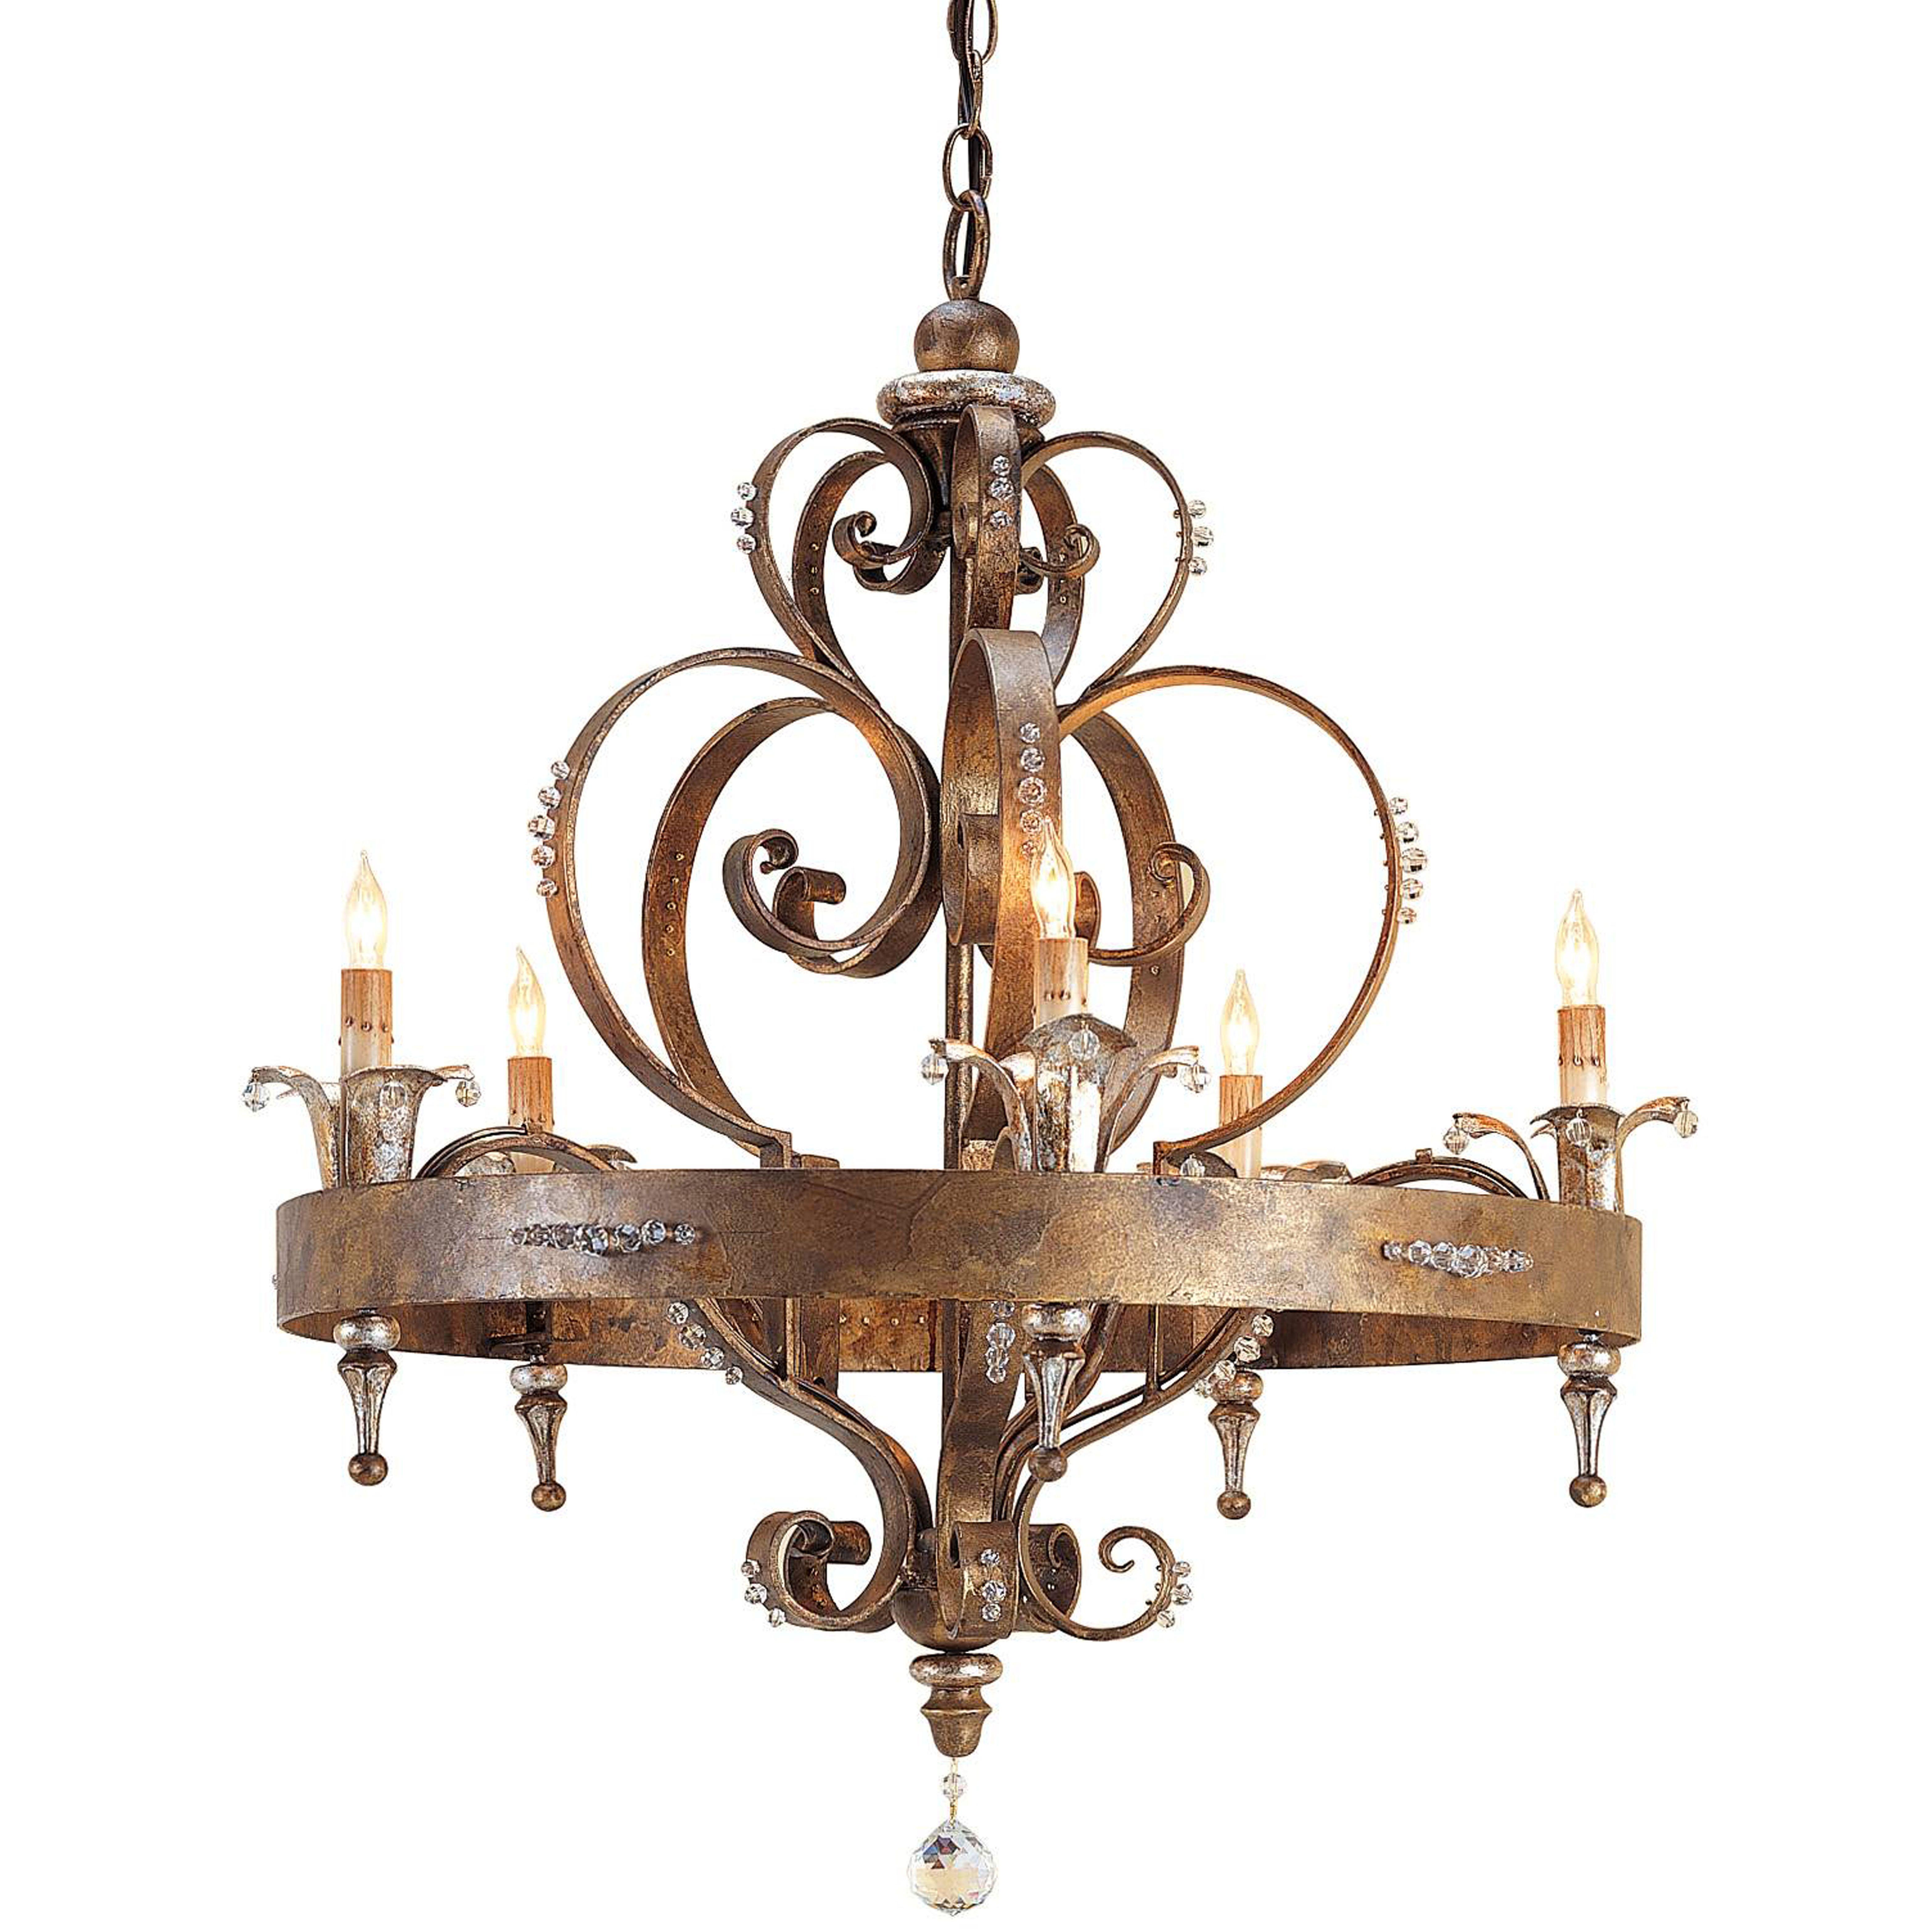 diy elegance vintage chandeliers wow sale hero easy for chandelier goodwill